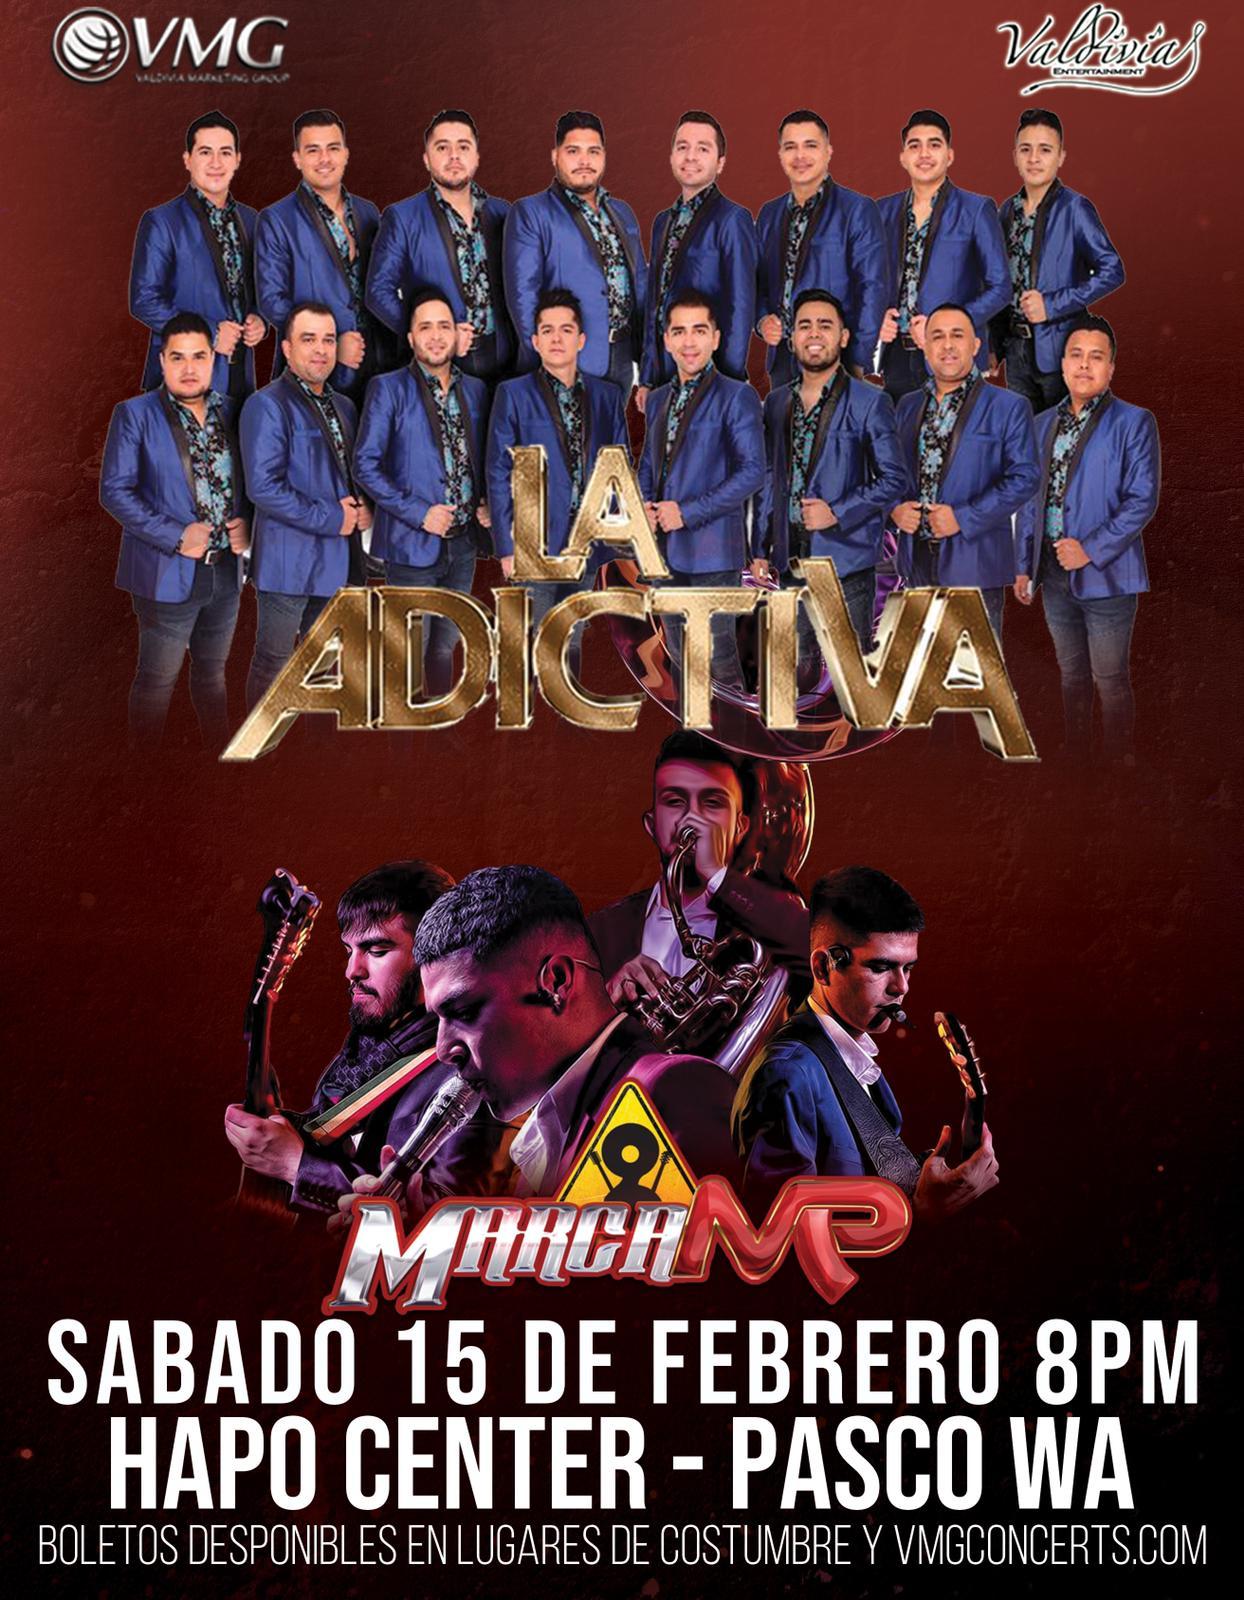 Banda La Adictiva y Marca MP – Hapo Center – Pasco, WA